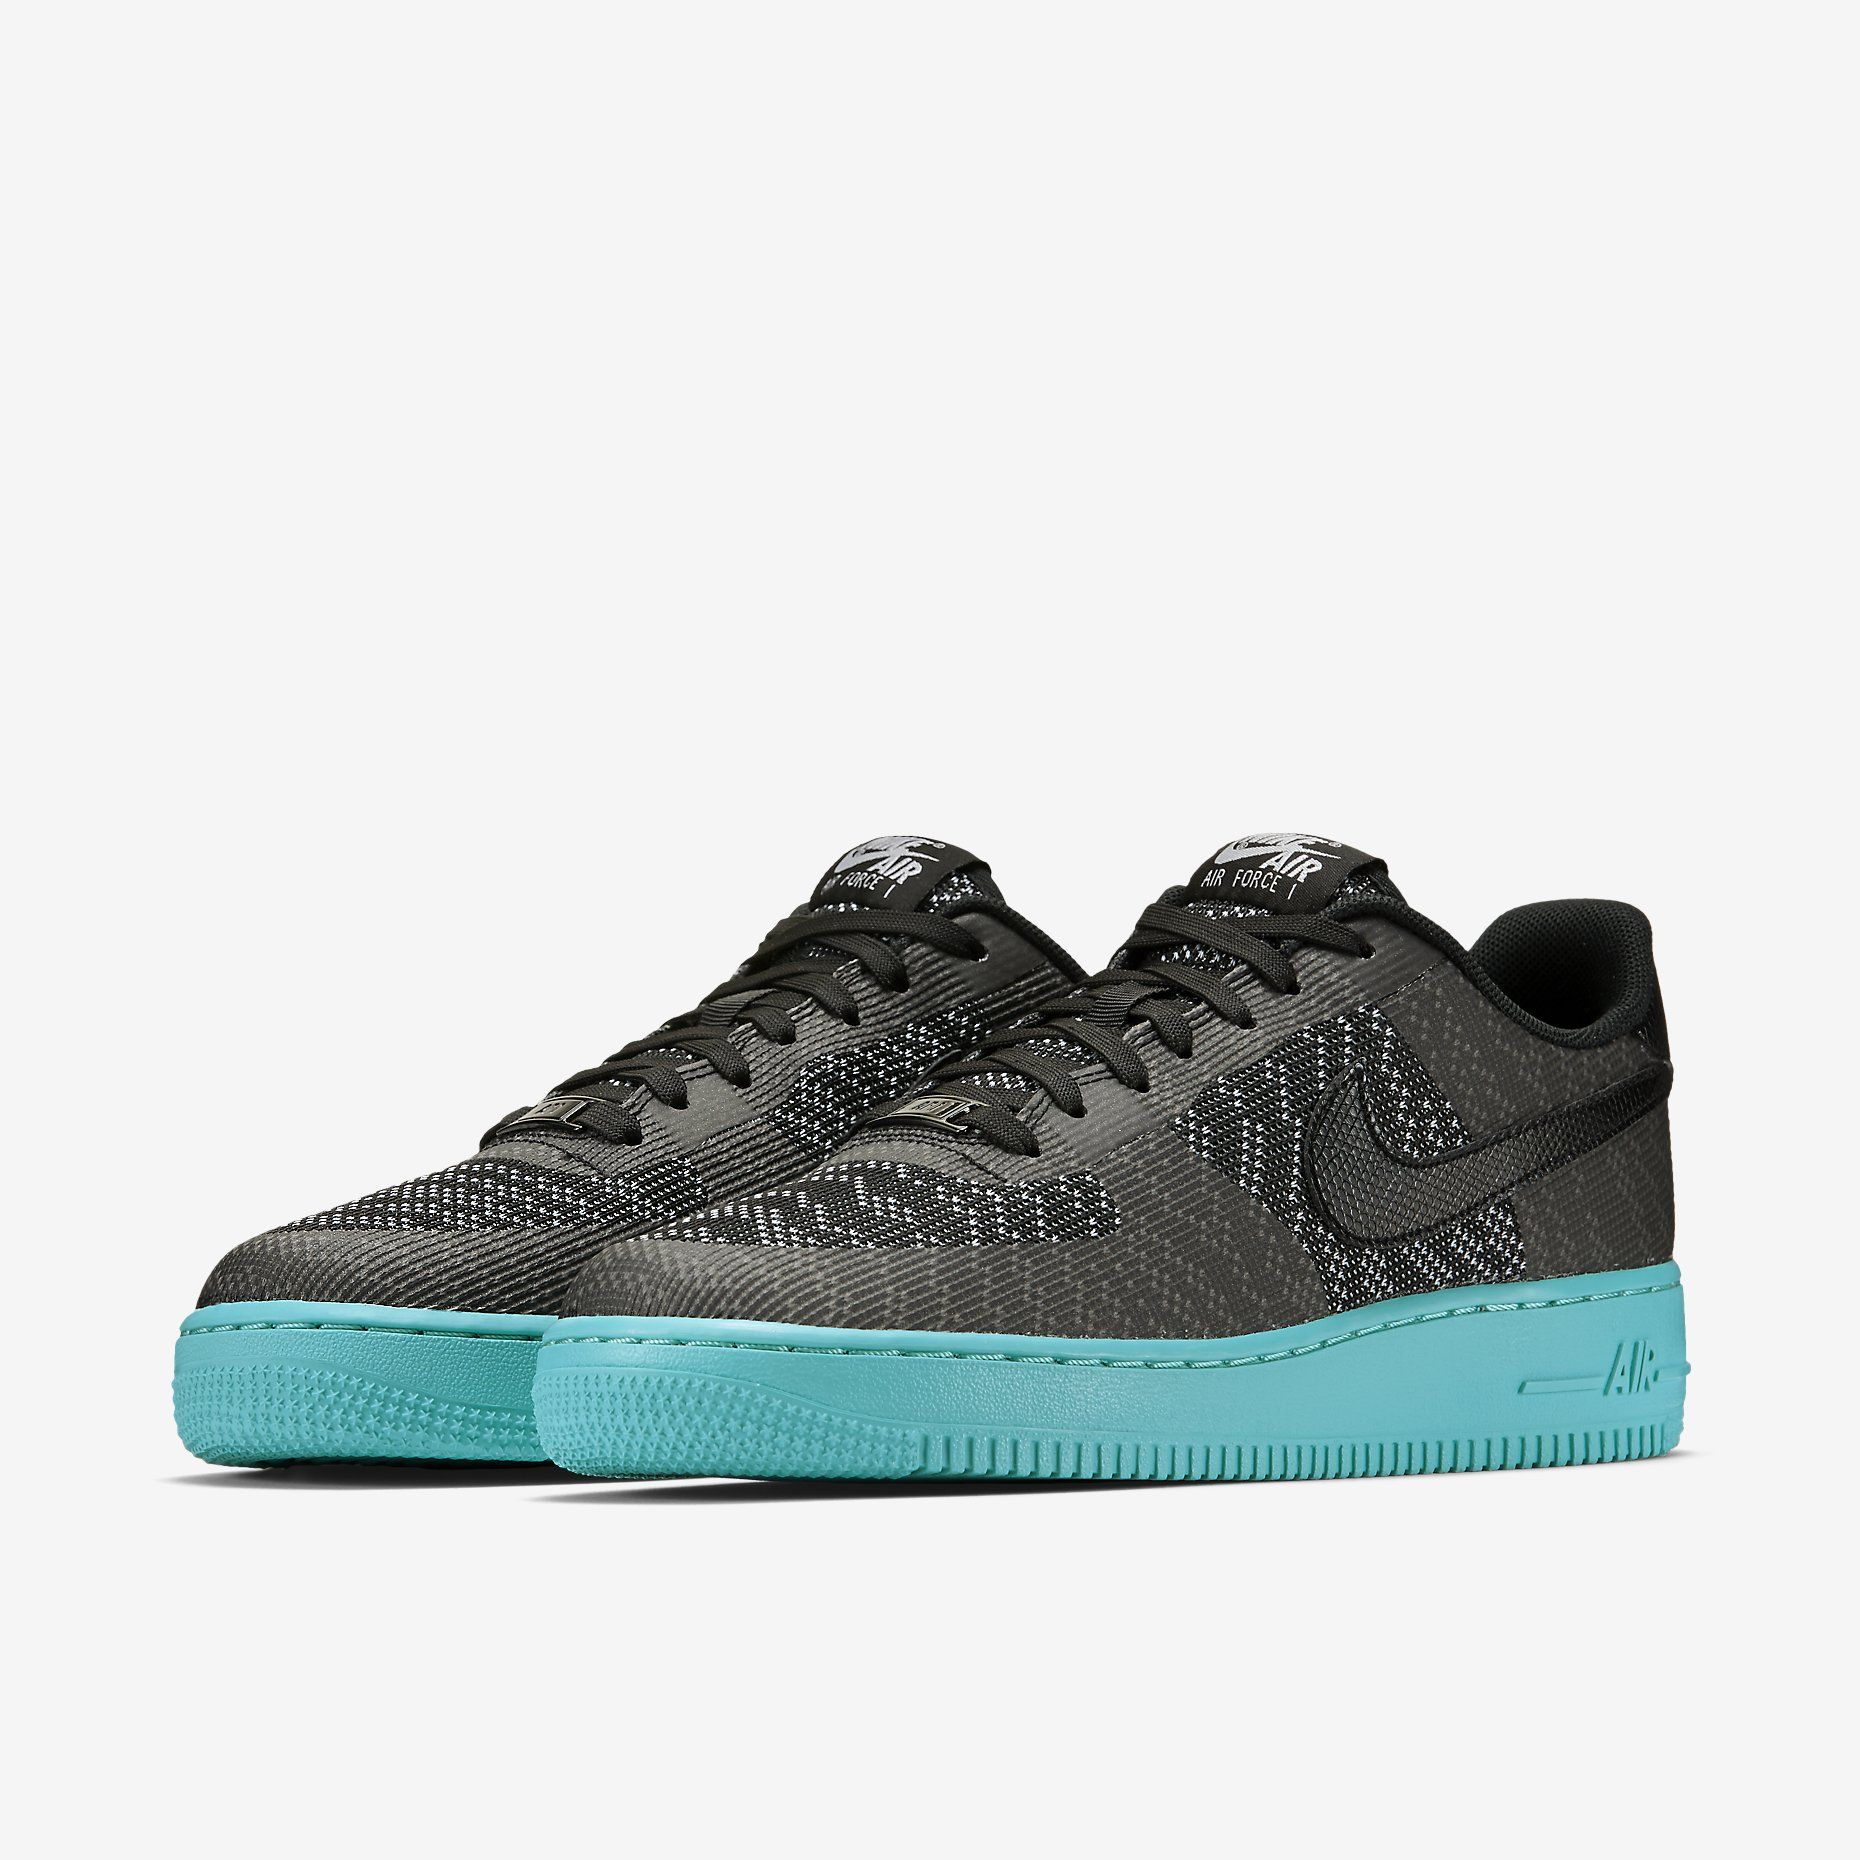 Nike Air Force 1 07 Knit Jacquard – Chaussure pour Femme | Sneaker Flow |  Pinterest | Nike air force, Chaussures pour femmes et Nike air